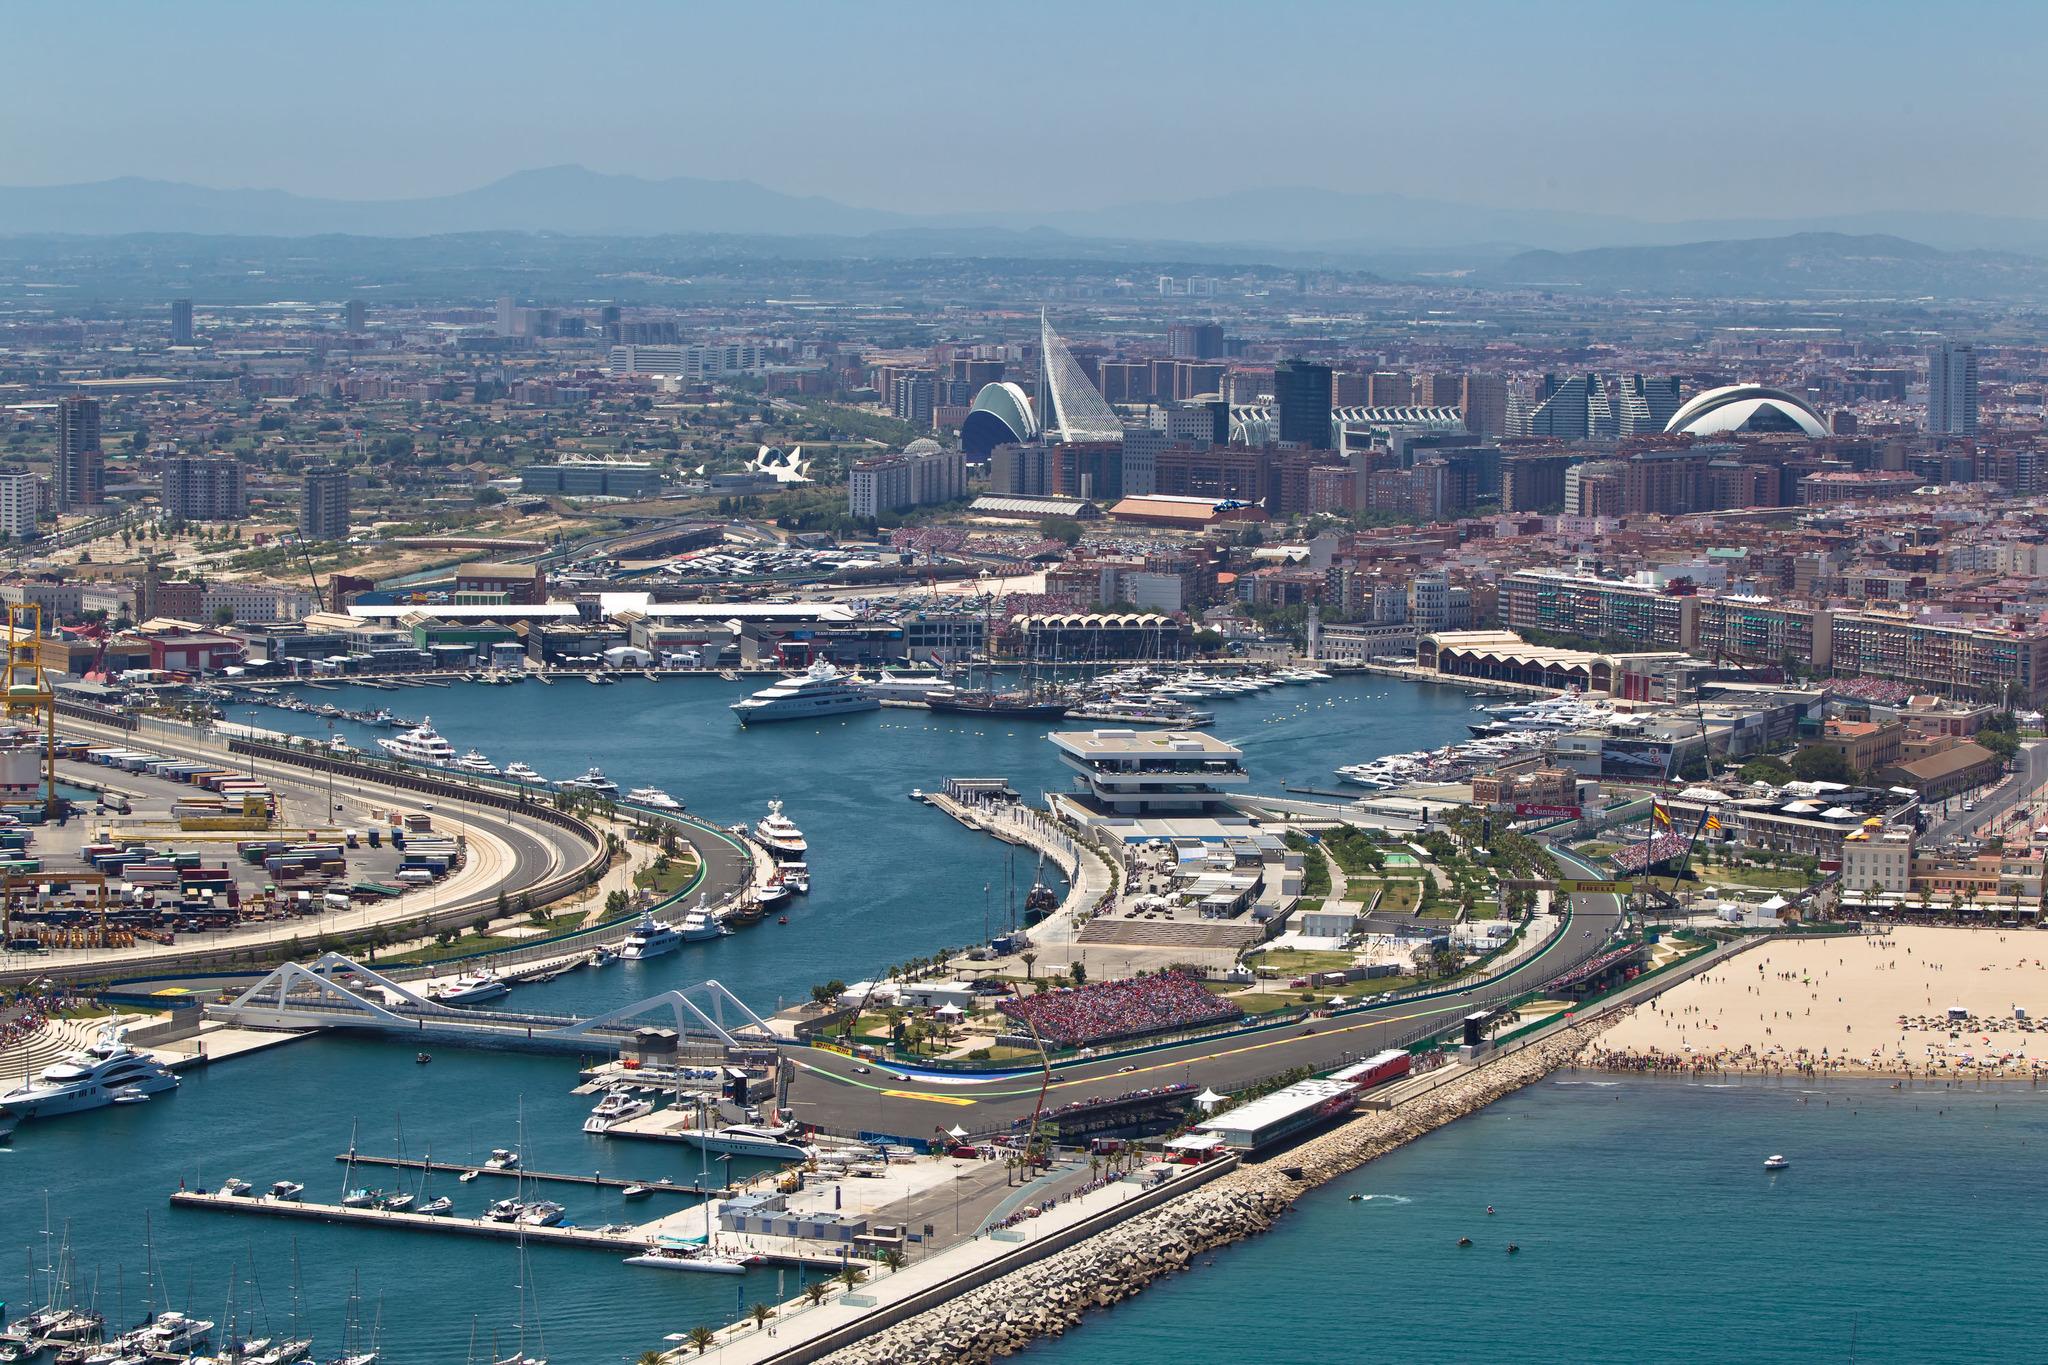 Valencia. Fuente: http://eladerezo.hola.com/